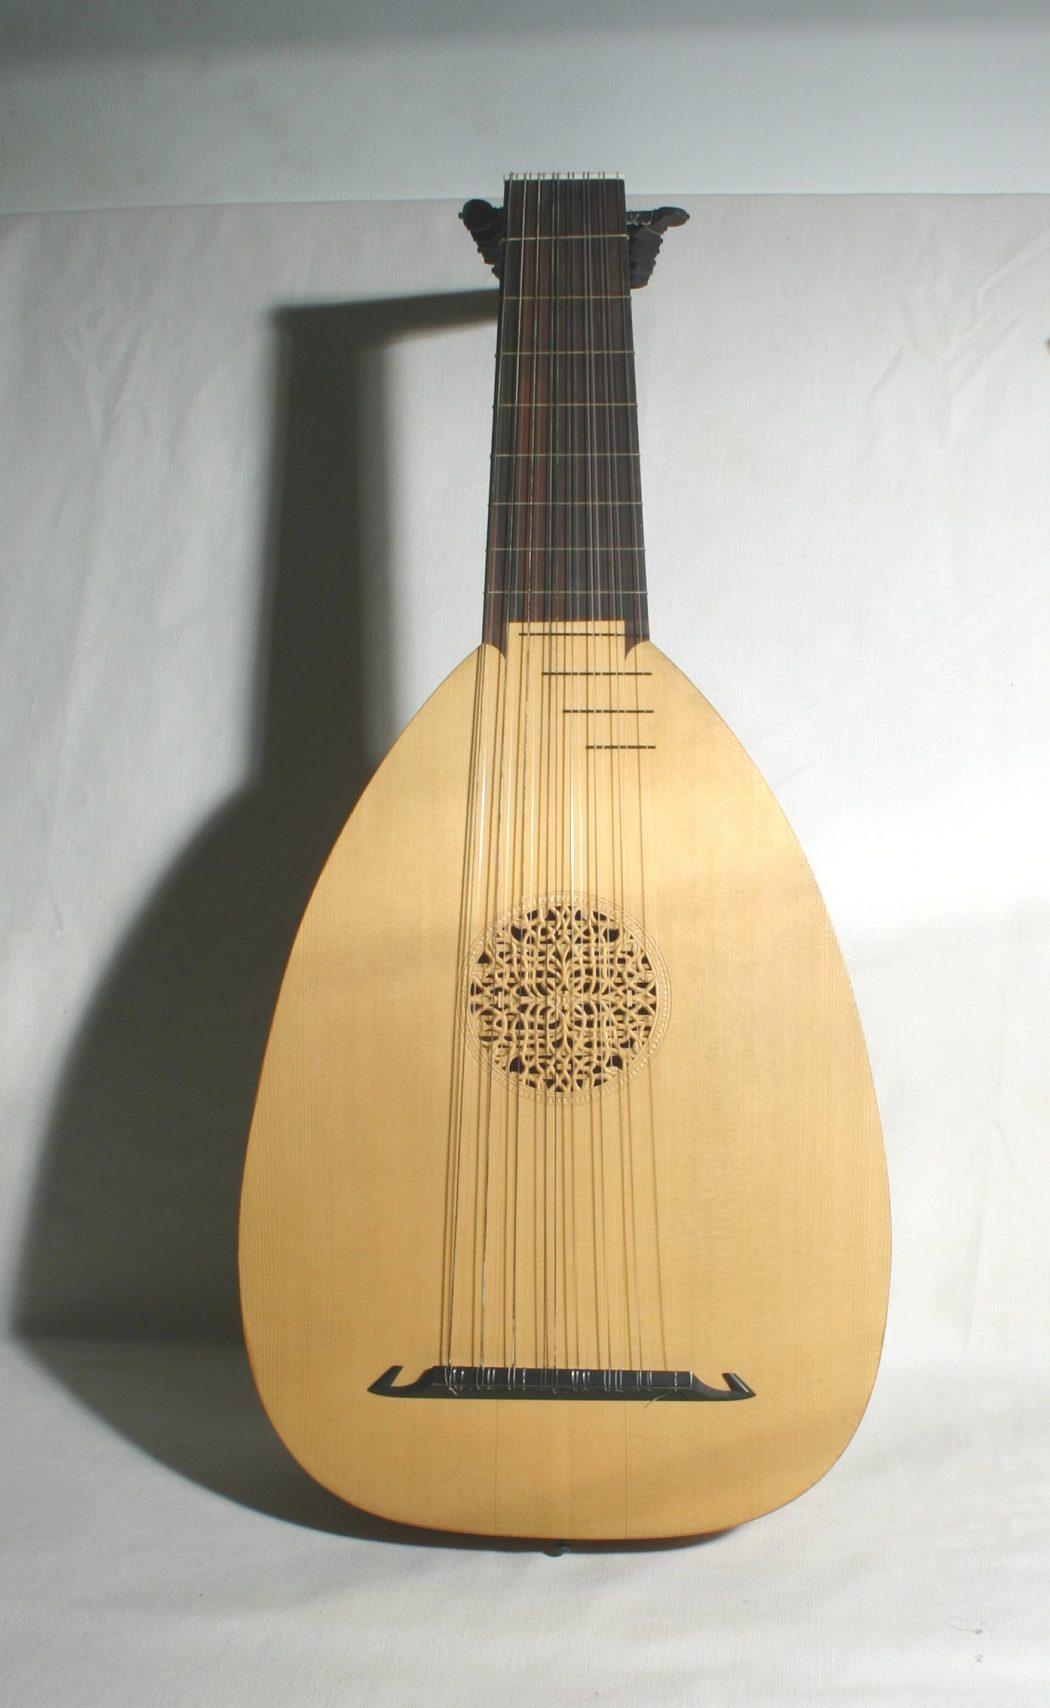 lute1j Top 10 Muslim Inventions